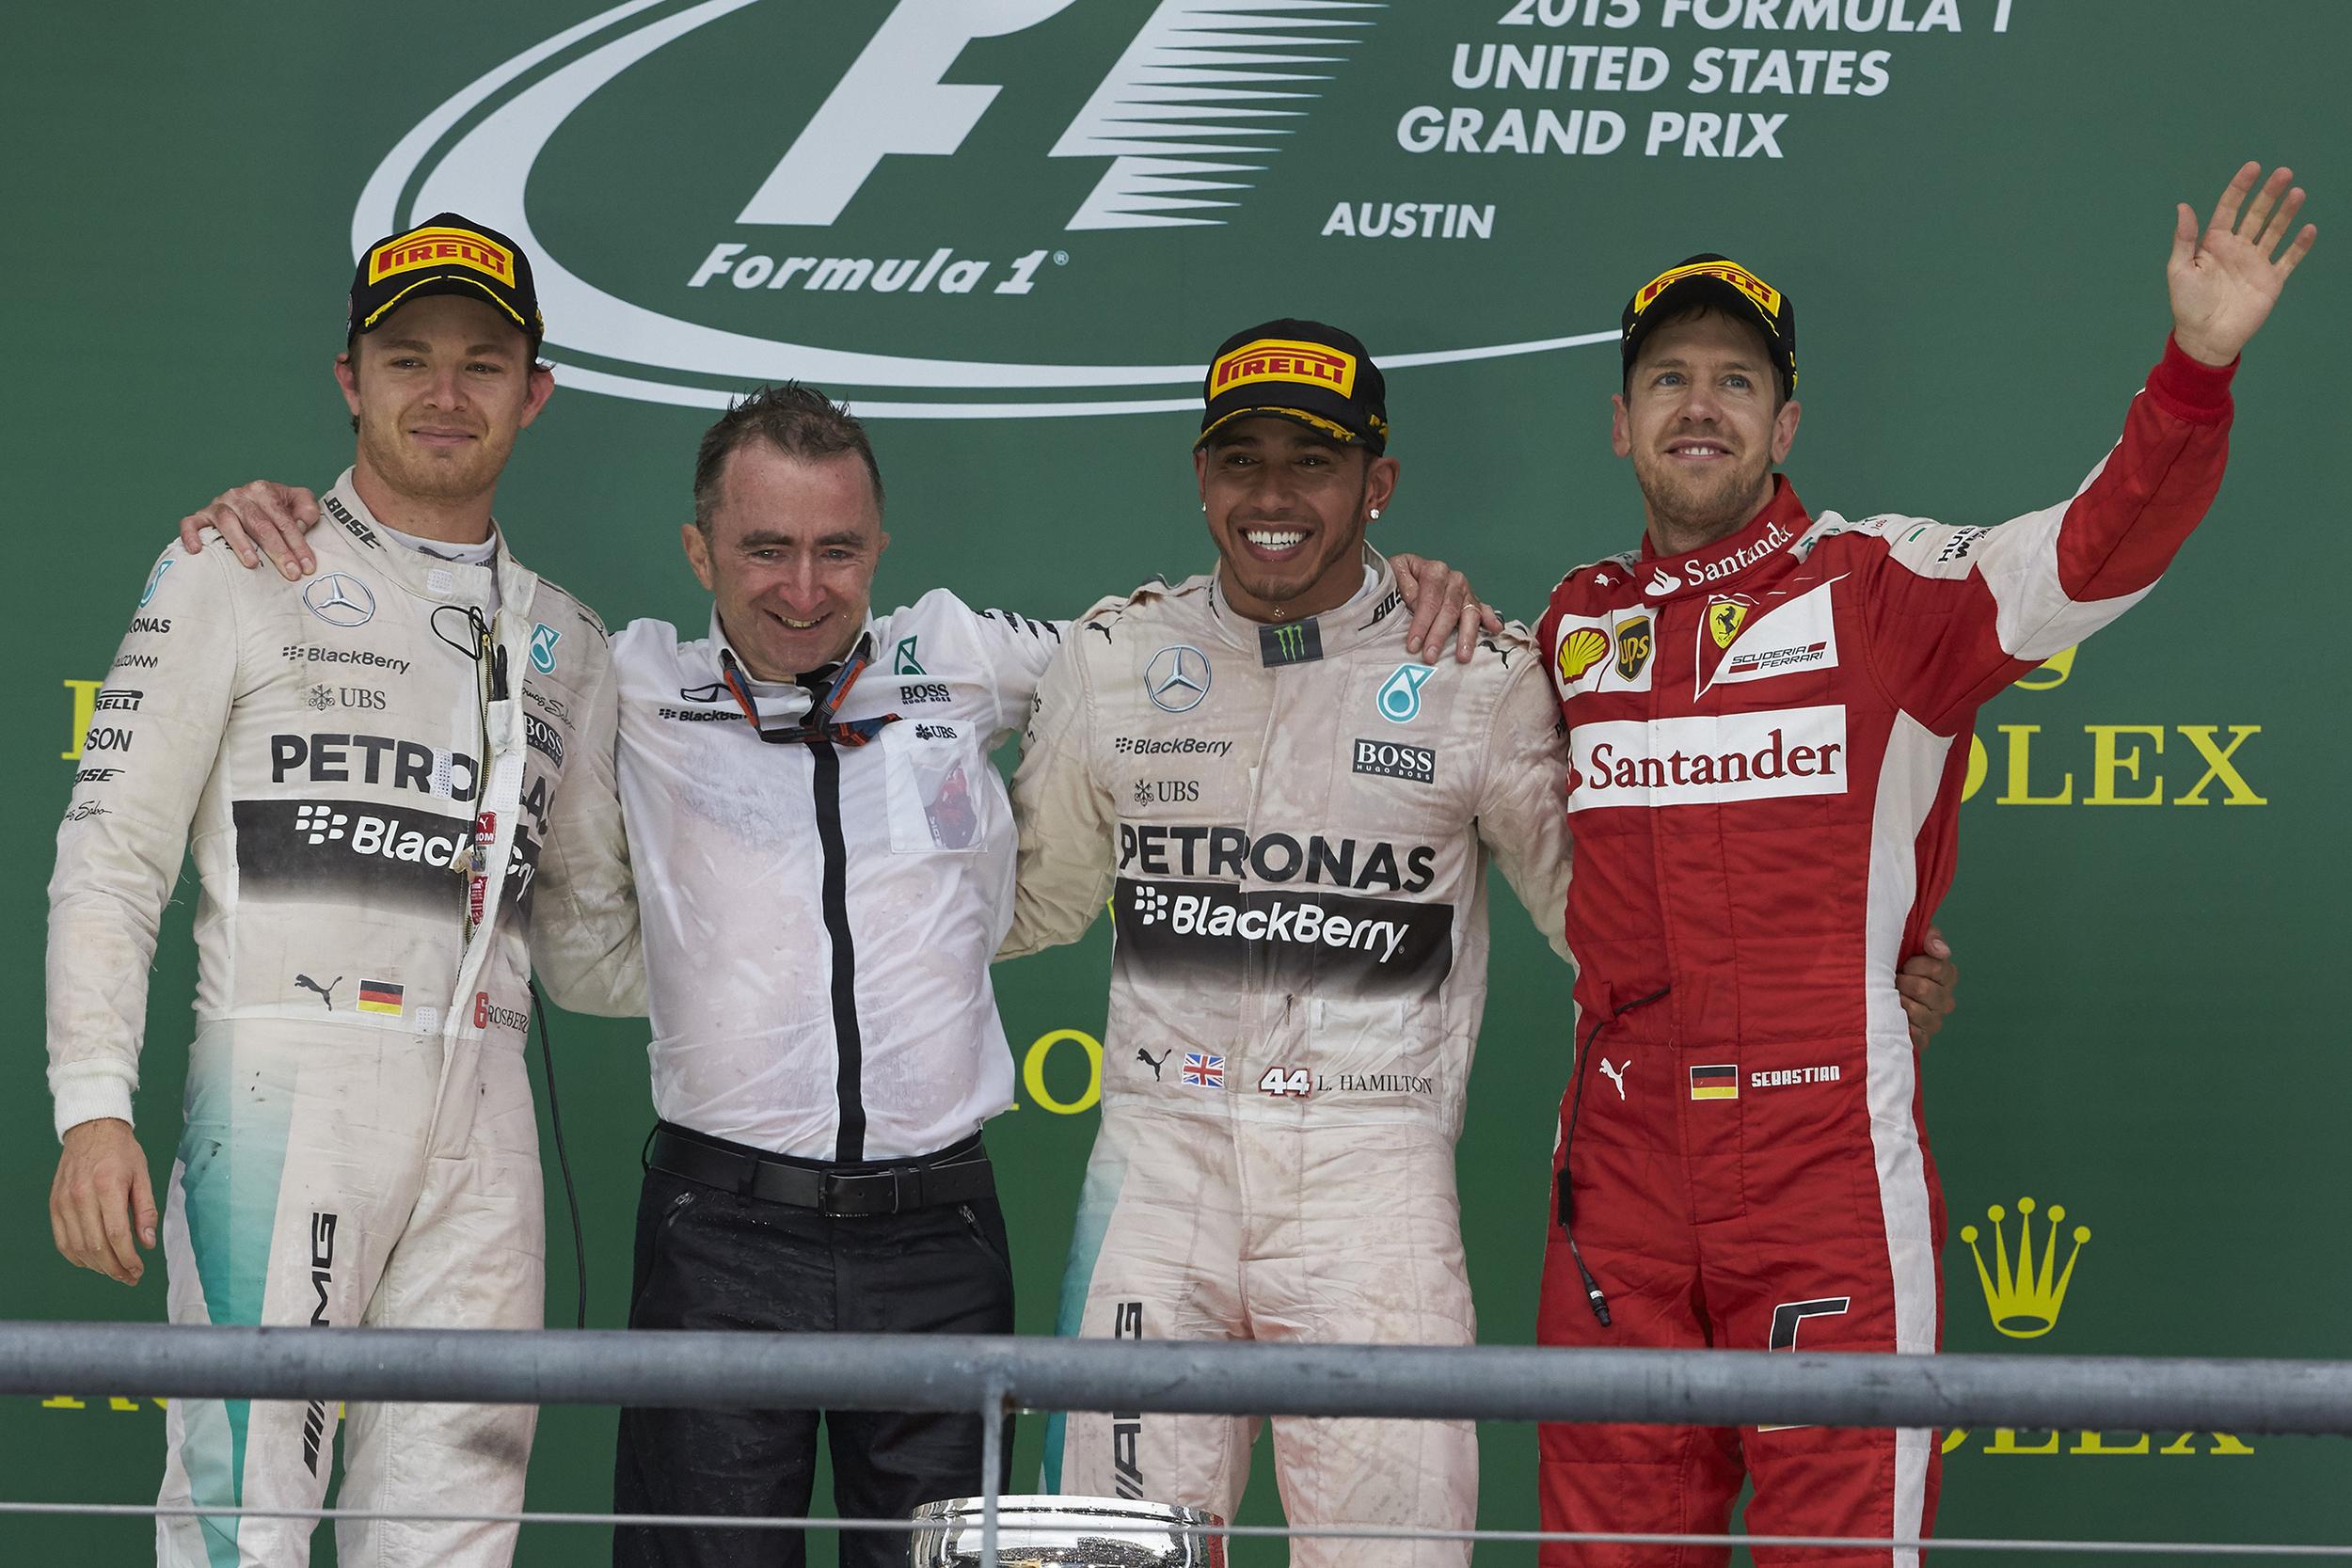 Lewis Hamilton wins third F1 World Championship